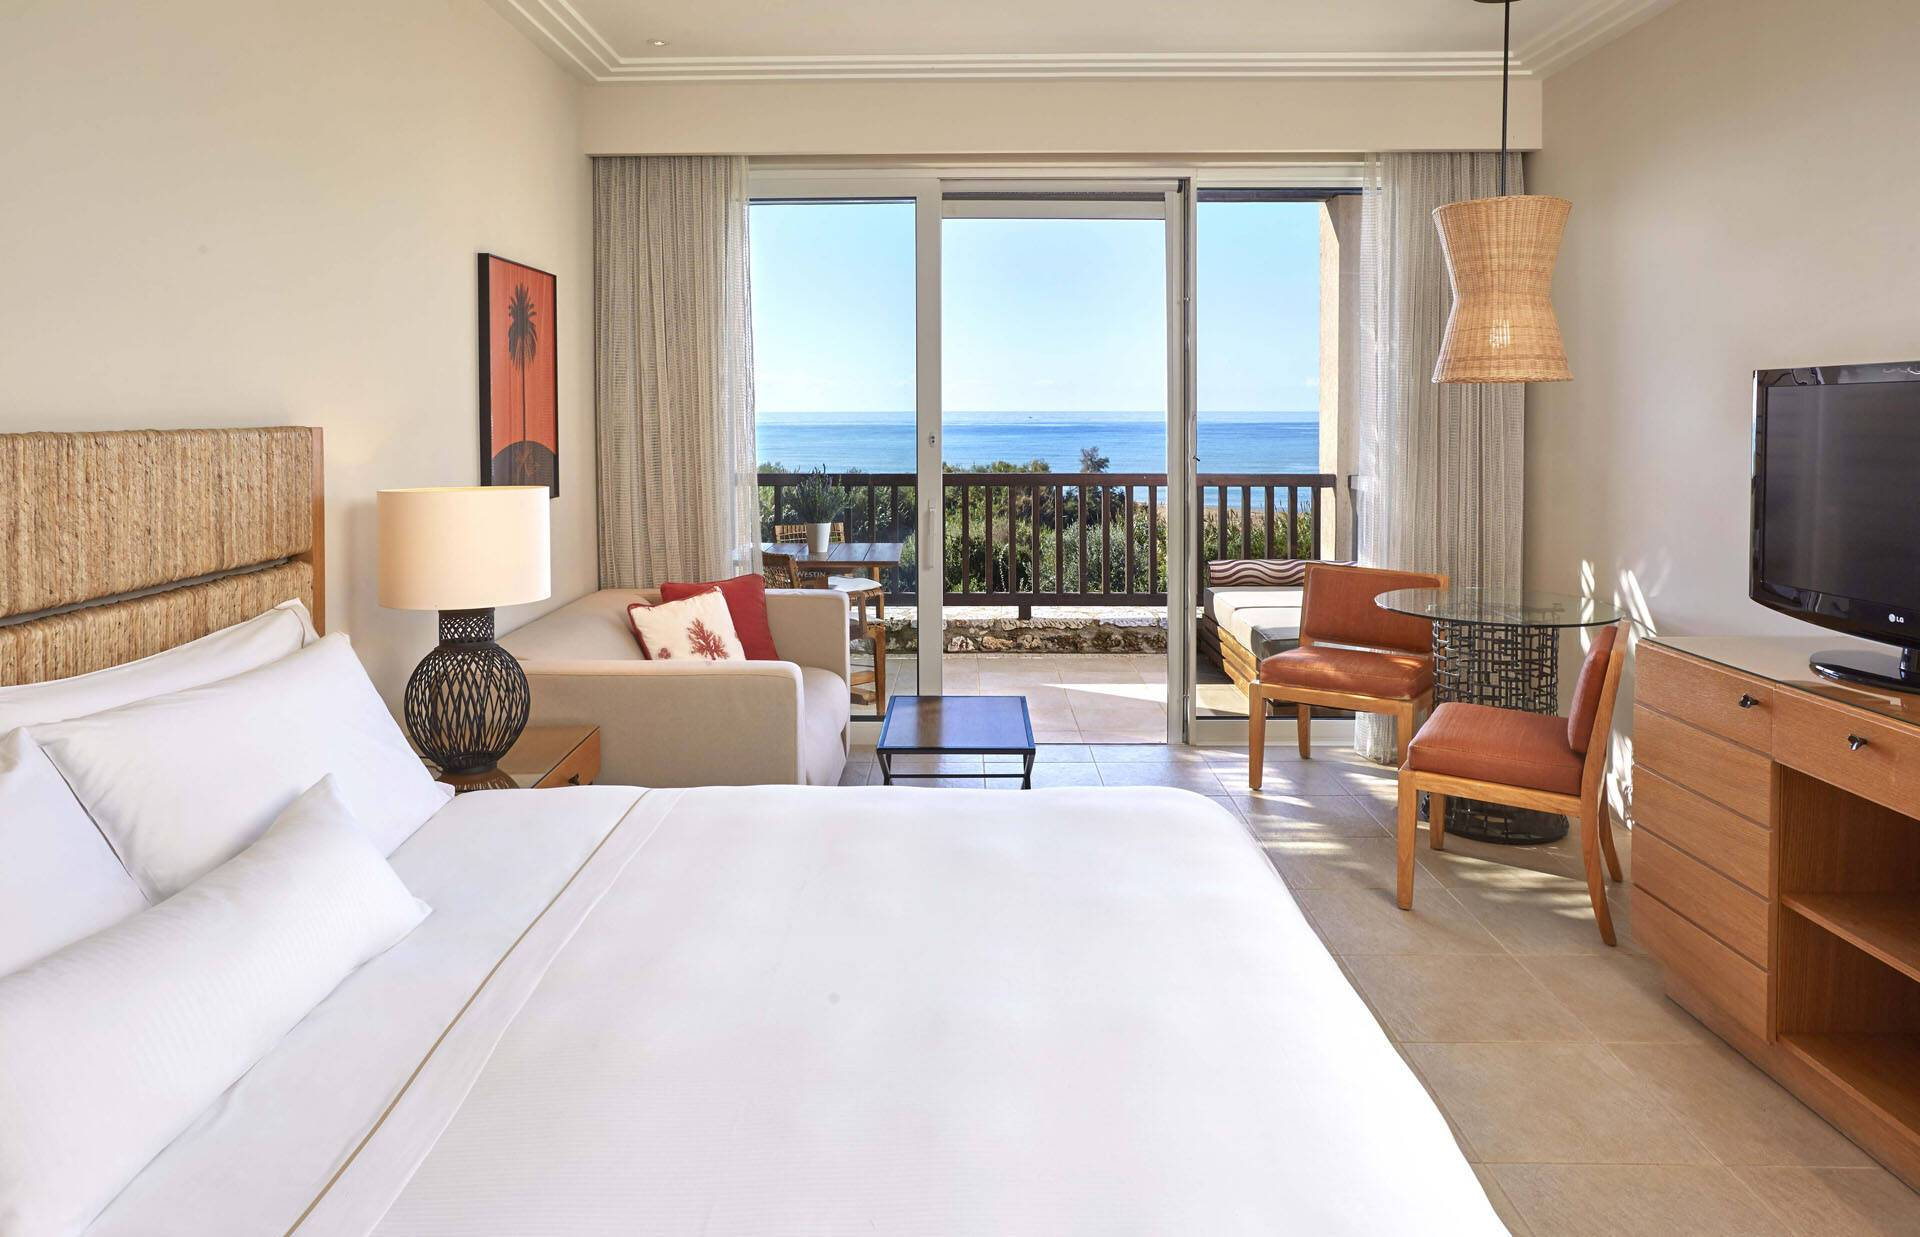 Costa Navarino Peloponnese Premium Deluxe Room